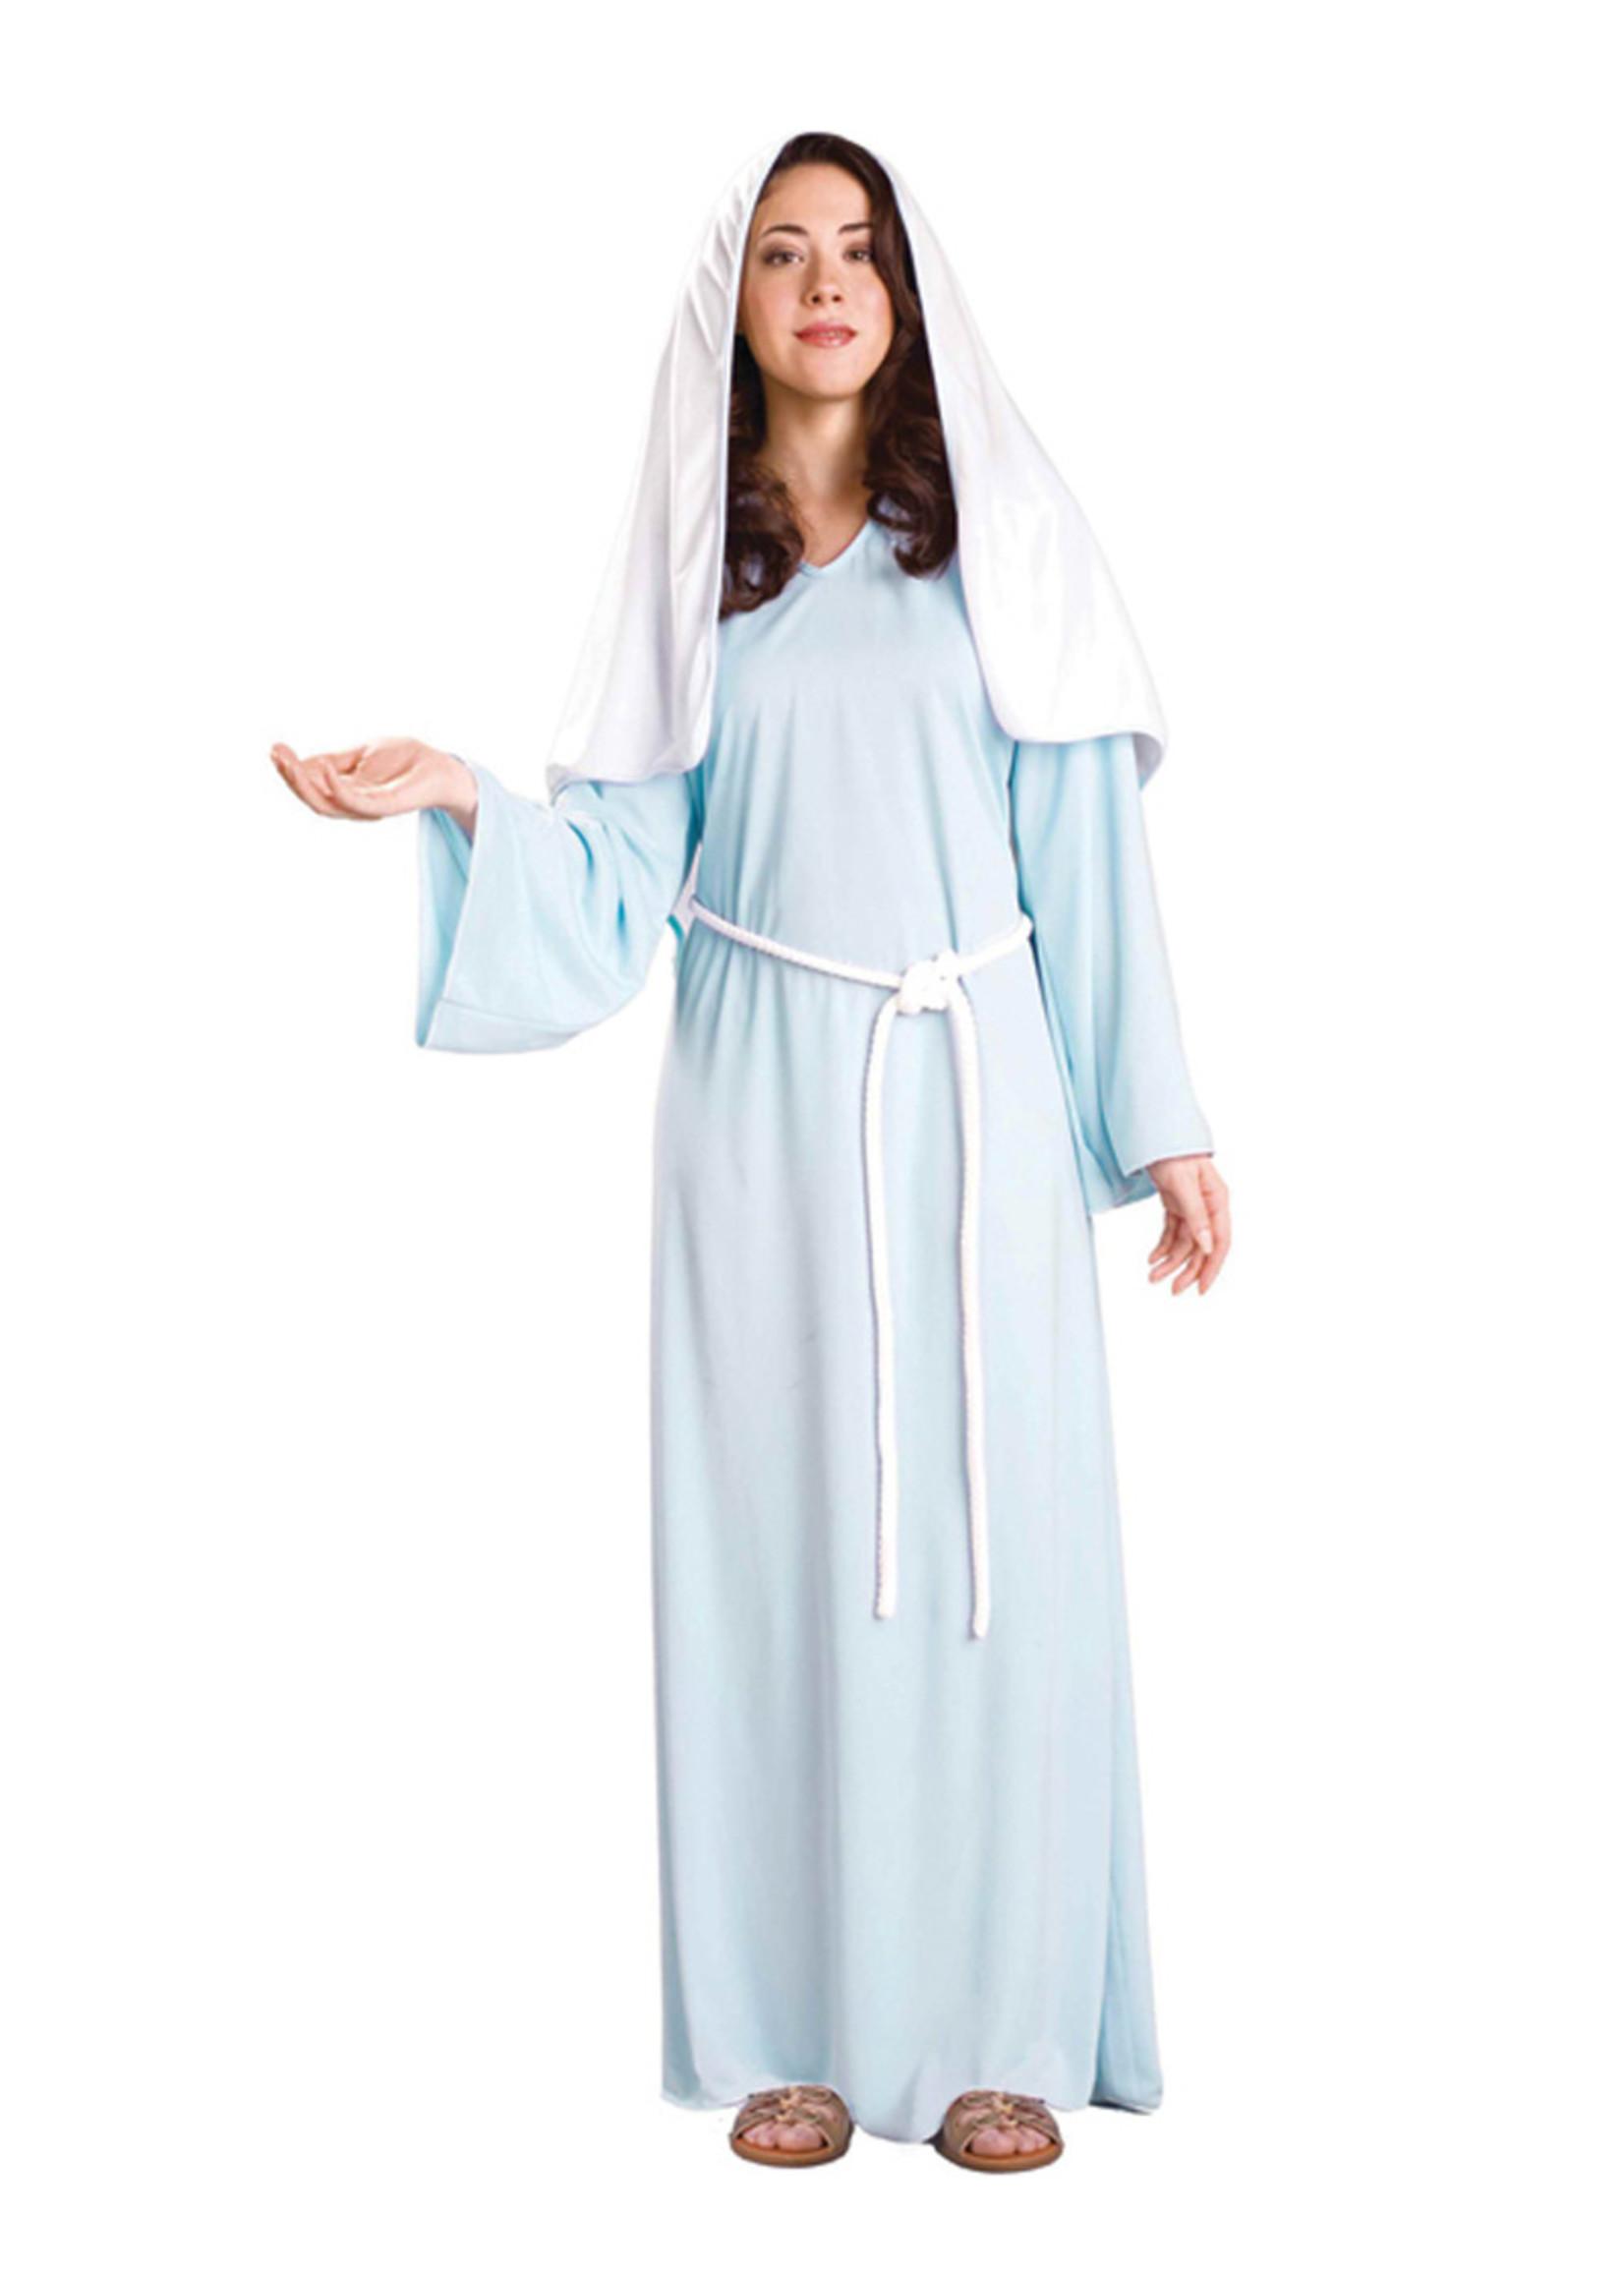 FORUM NOVELTIES Mary Costume - Women's